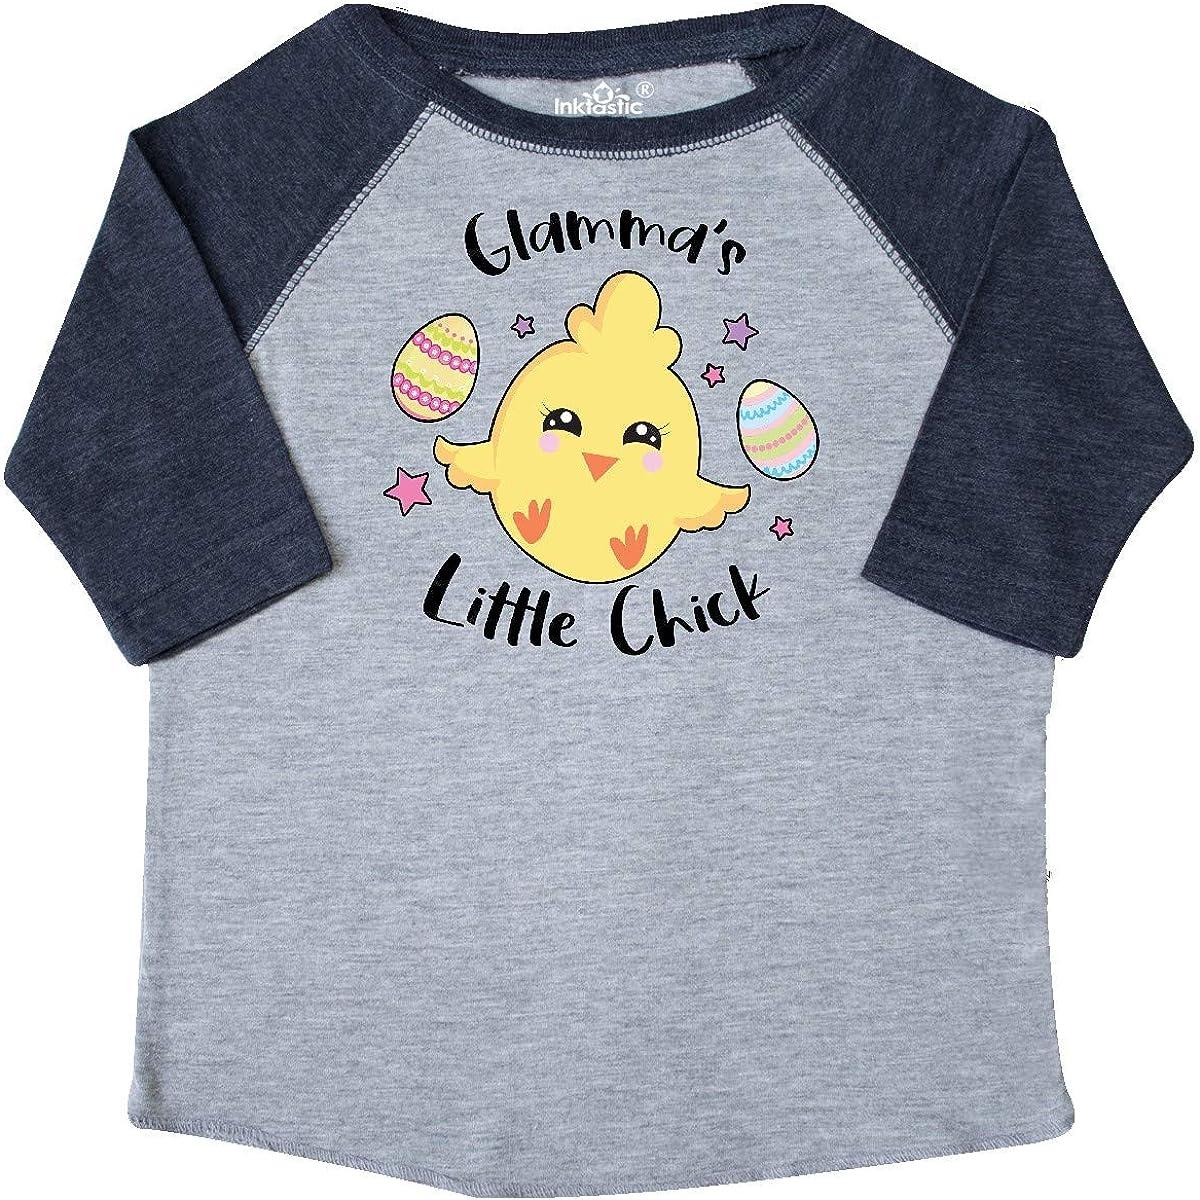 inktastic Happy Easter Glammas Little Chick Toddler T-Shirt